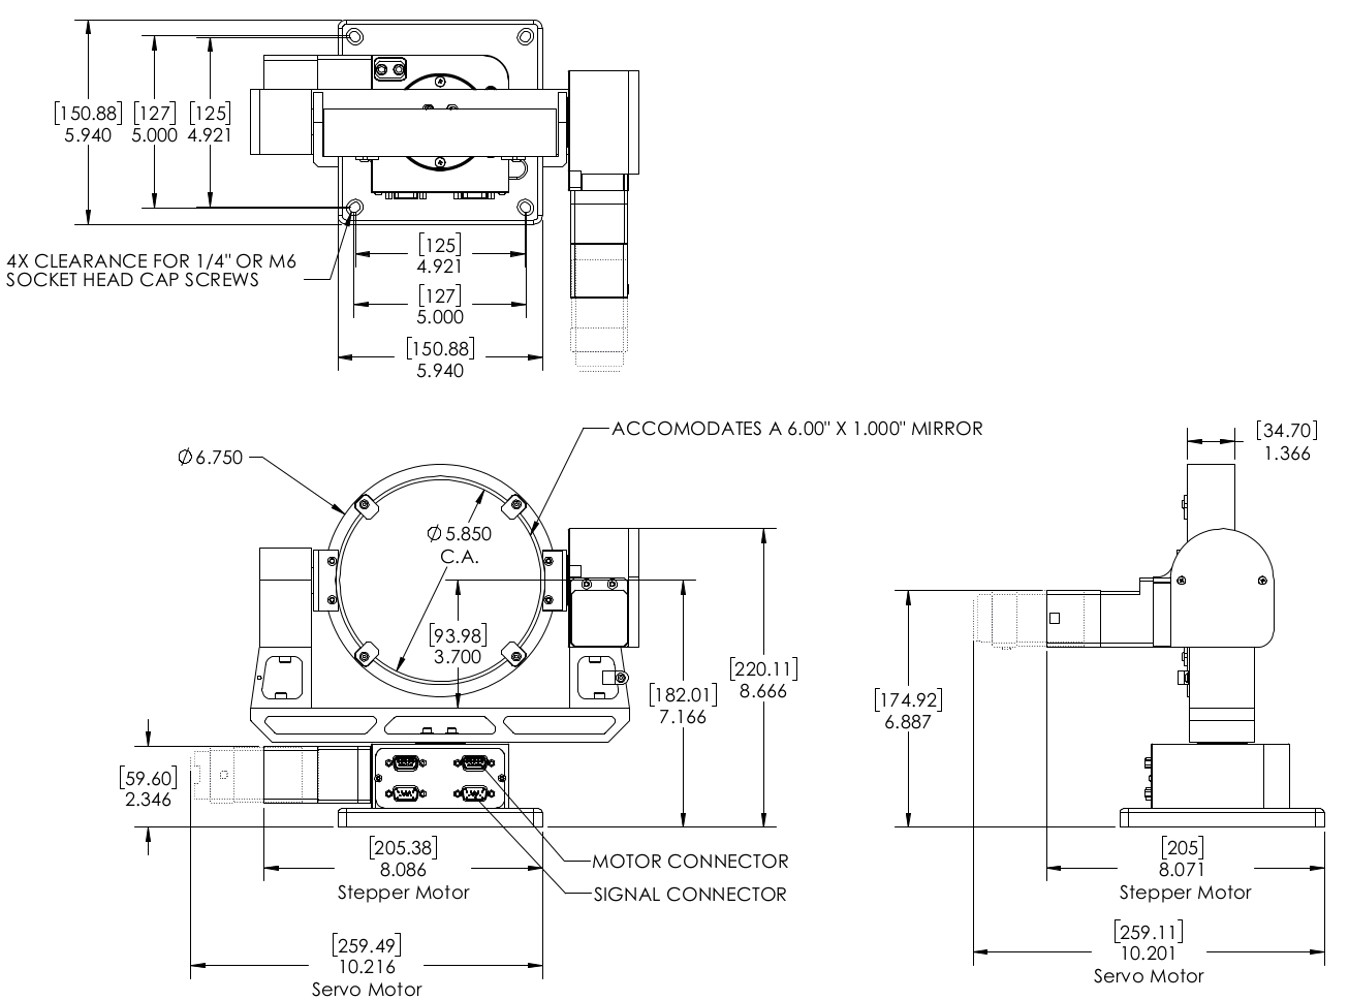 Gm 6 Gimbal additionally Nema 17 stepper motor 42byg020 moreover Ms24hs2p4300 000004611110015722 as well Stepper Motor NEMA 23 57x57mm together with Nema 23 stepping motor 57bygh317. on nema 8 stepper motor dimensions